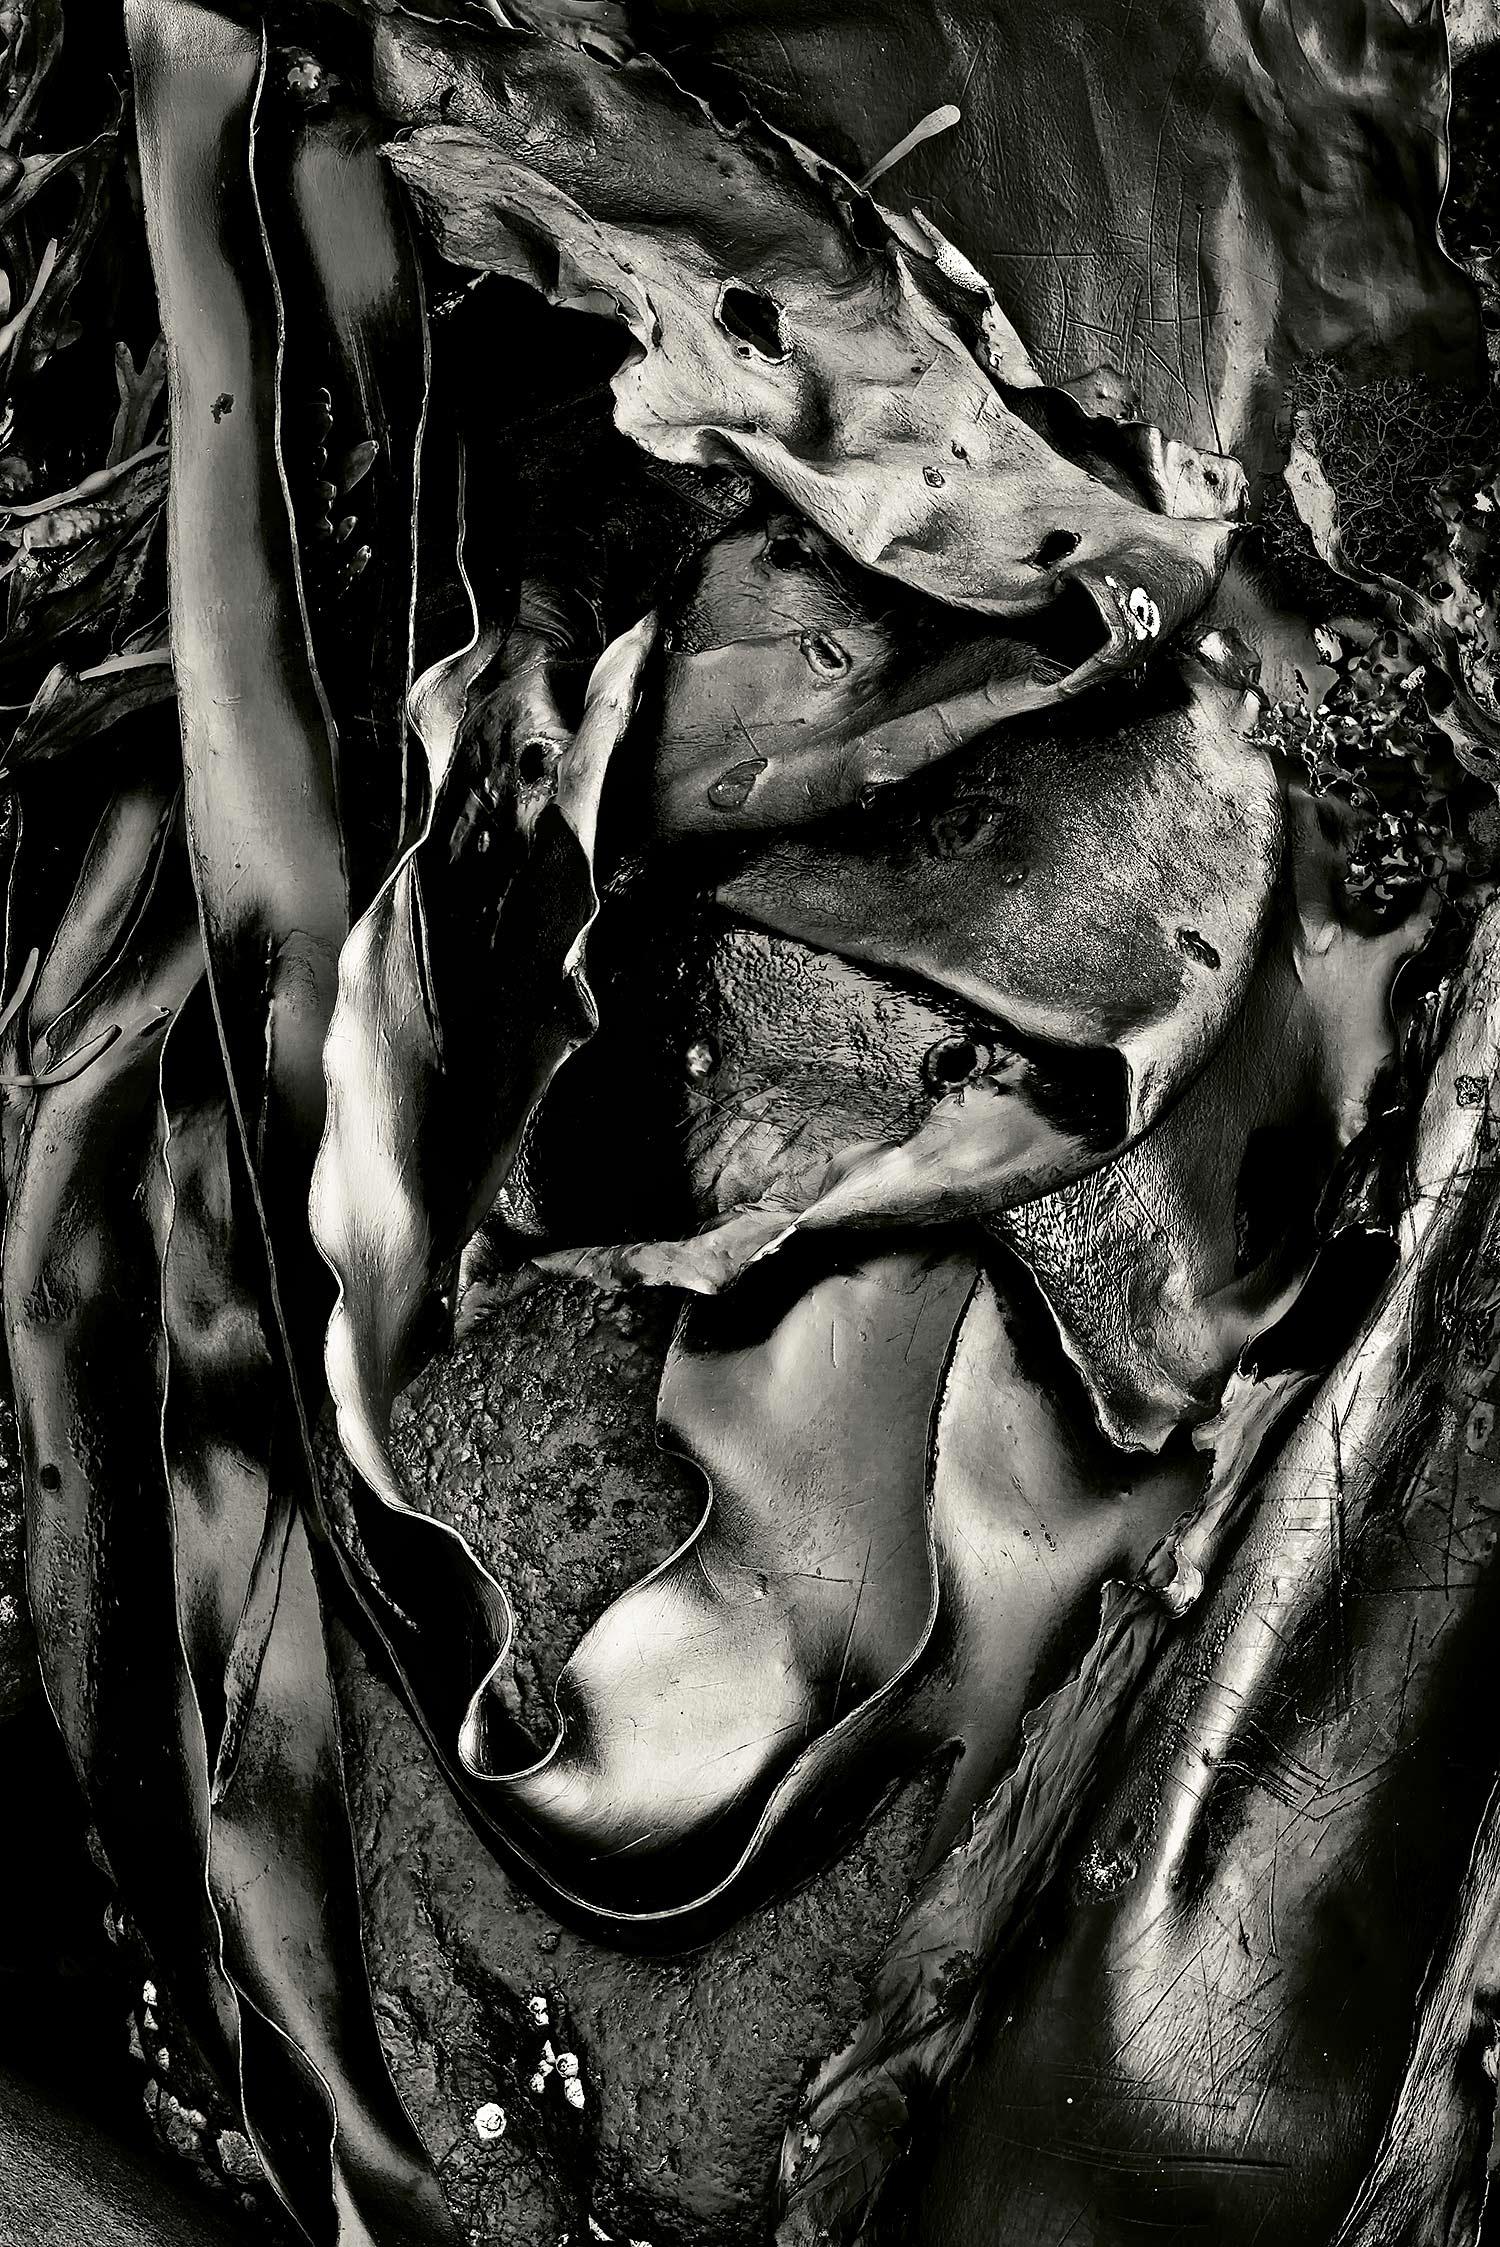 Seaweed 436, Seawall, Maine, 2011